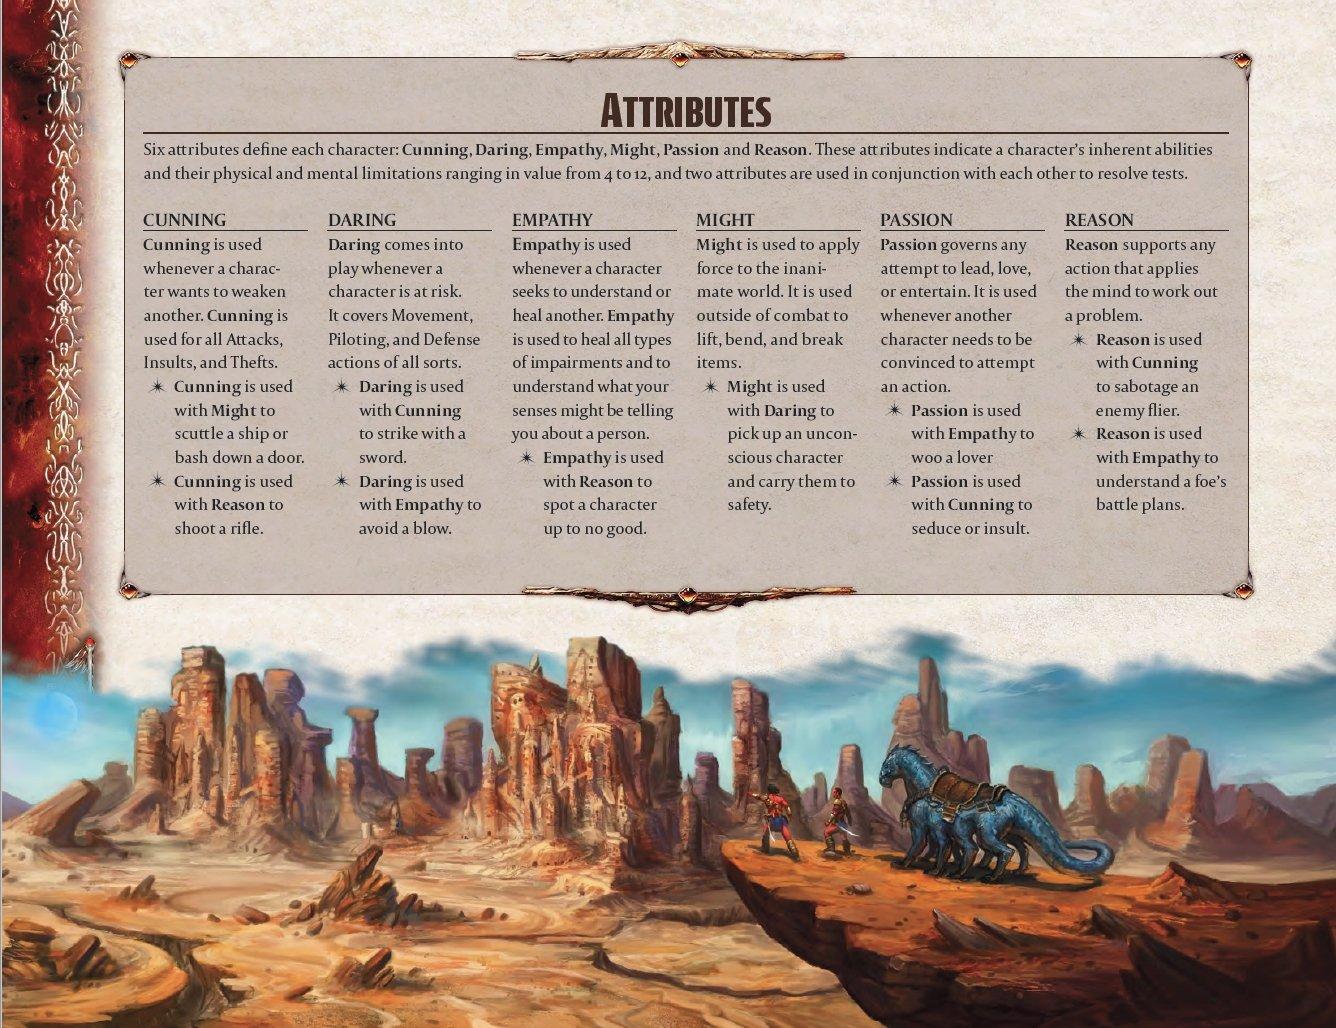 John Carter of Mars Role Playing Game, los atributos son diferentes para esta versión del sistema 2d20 para servir como elemento inmersivo